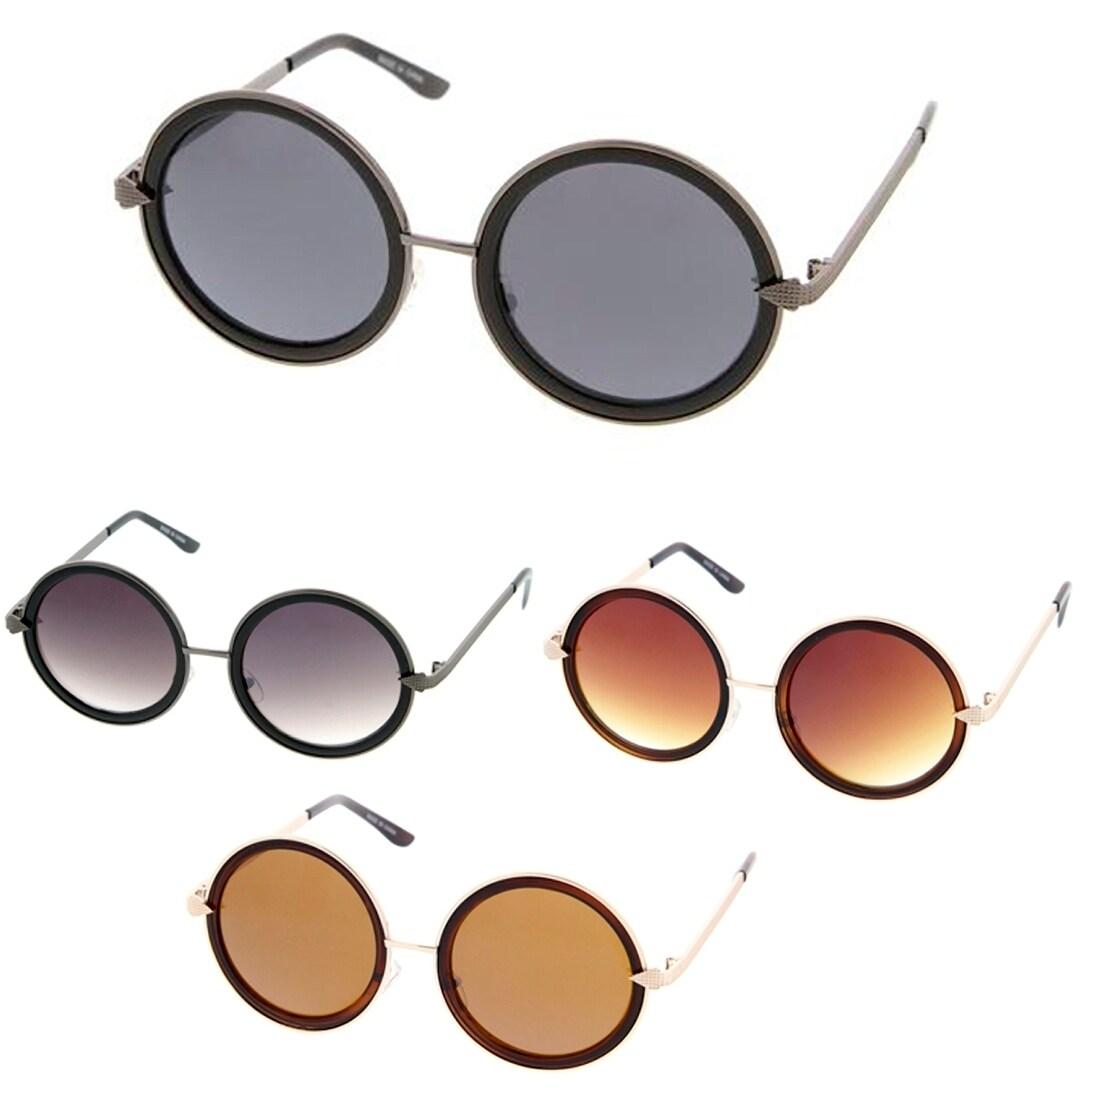 8db0c6ec6f Epic Eyewear Retro Fashion Round Thick Frame Women Sunglasses Model ...